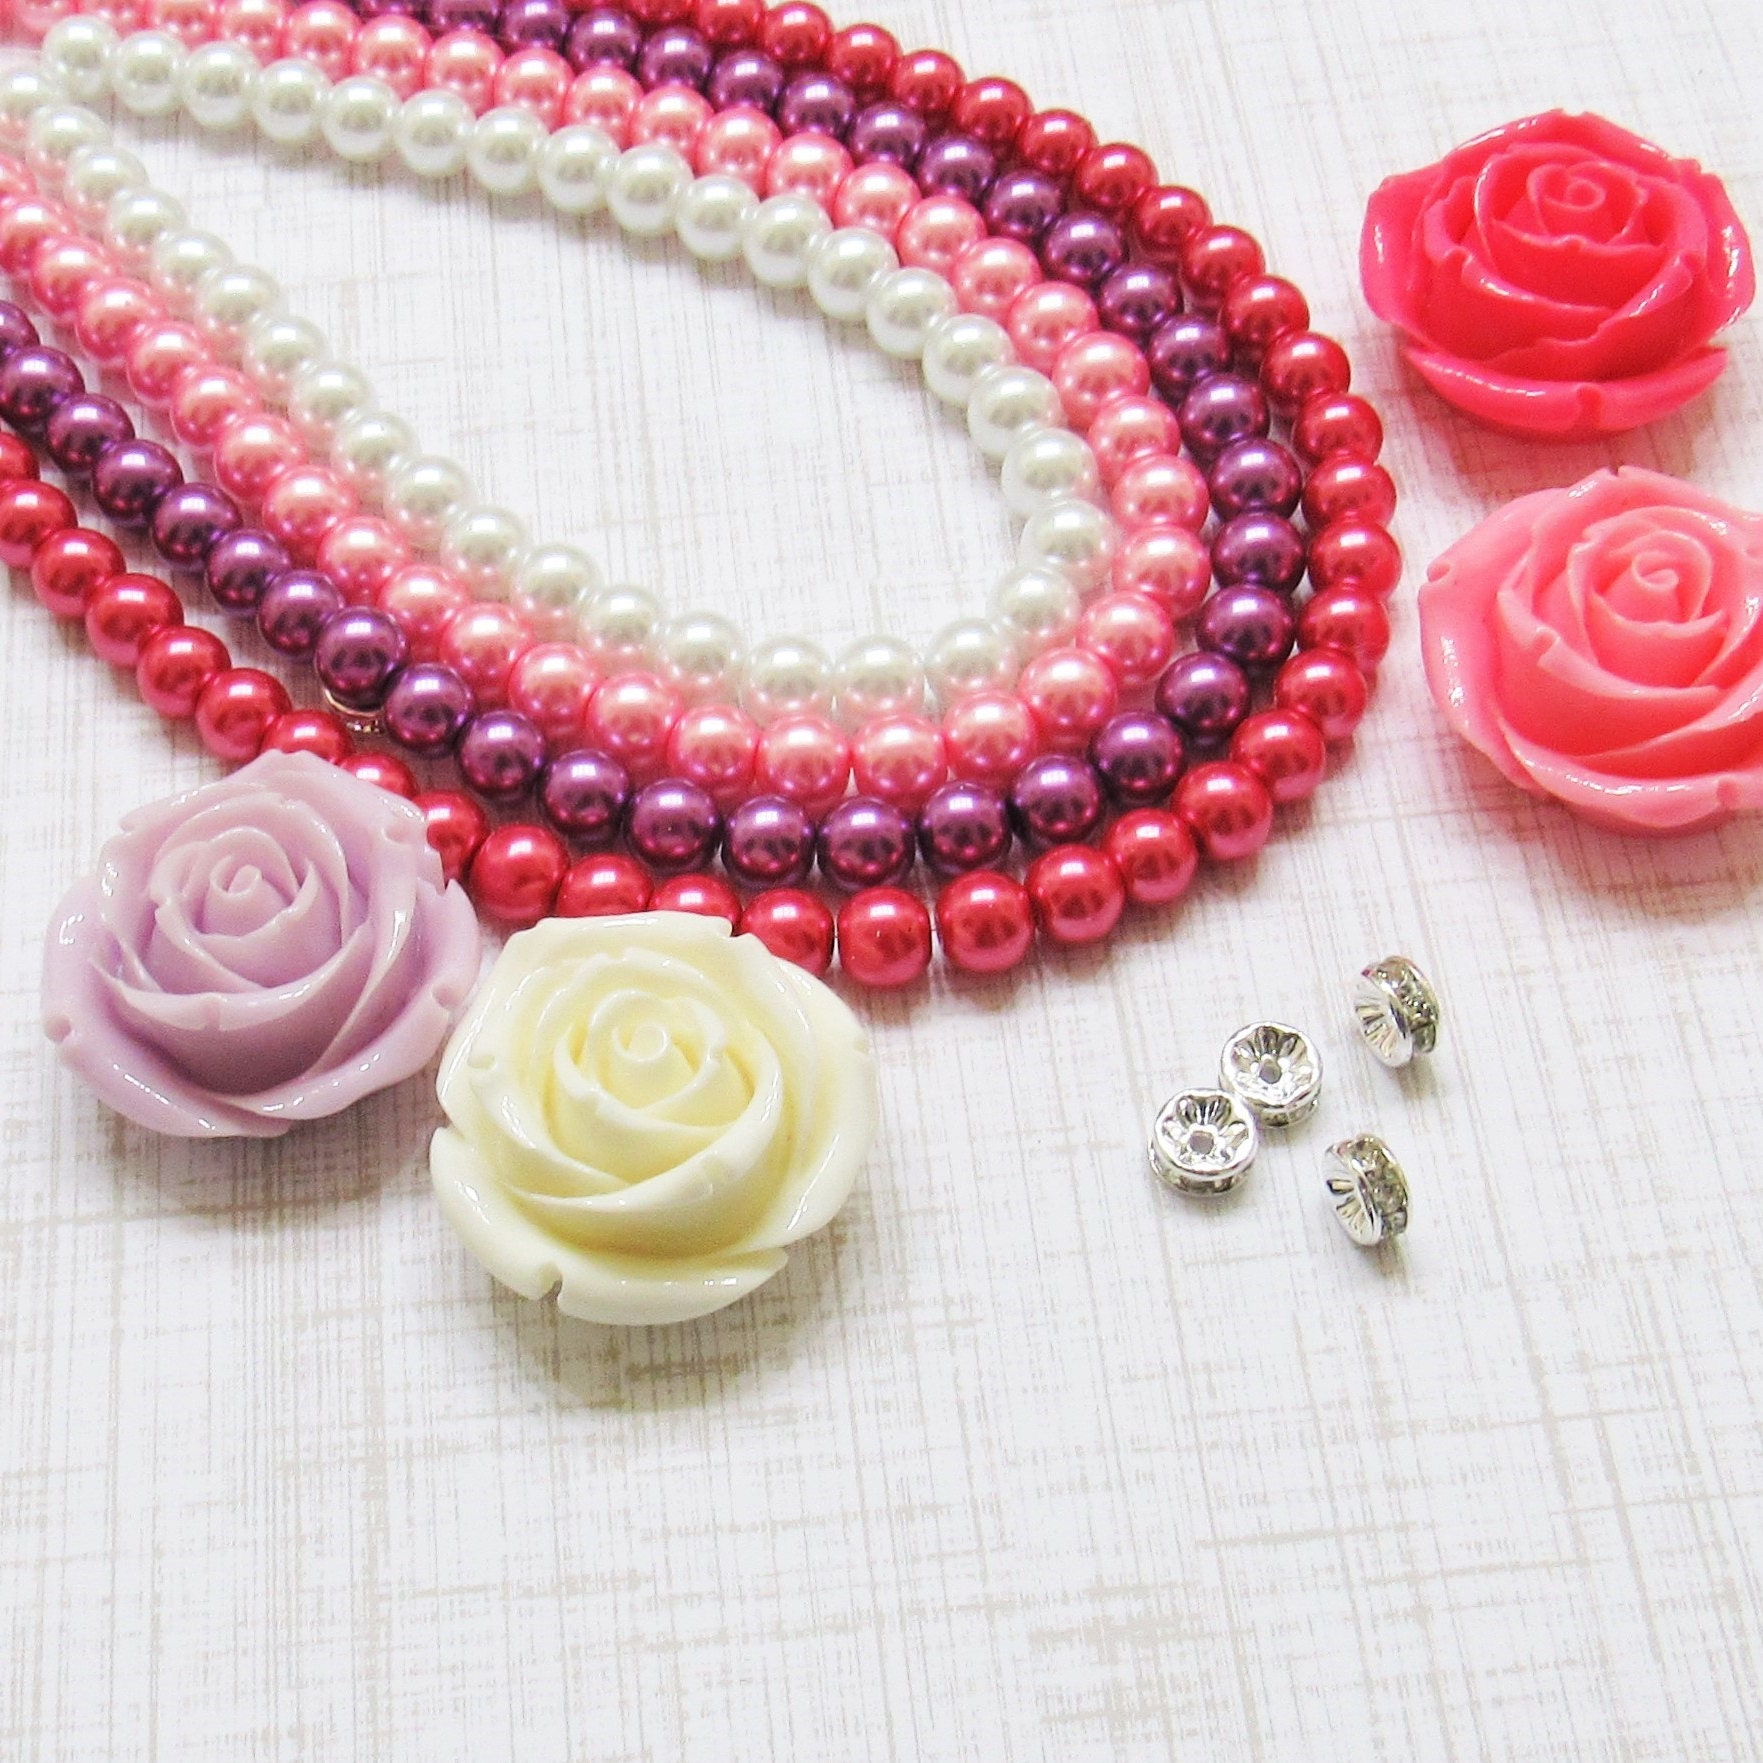 34mm Mickey Minnie Mouse Bubblegum Beads Transparent Acrylic | Etsy